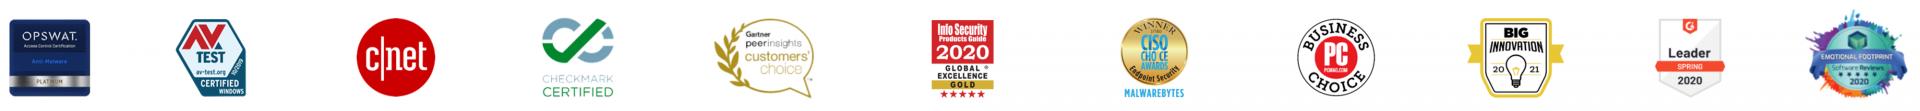 Malwarebytes Awards & Recognitions 2020